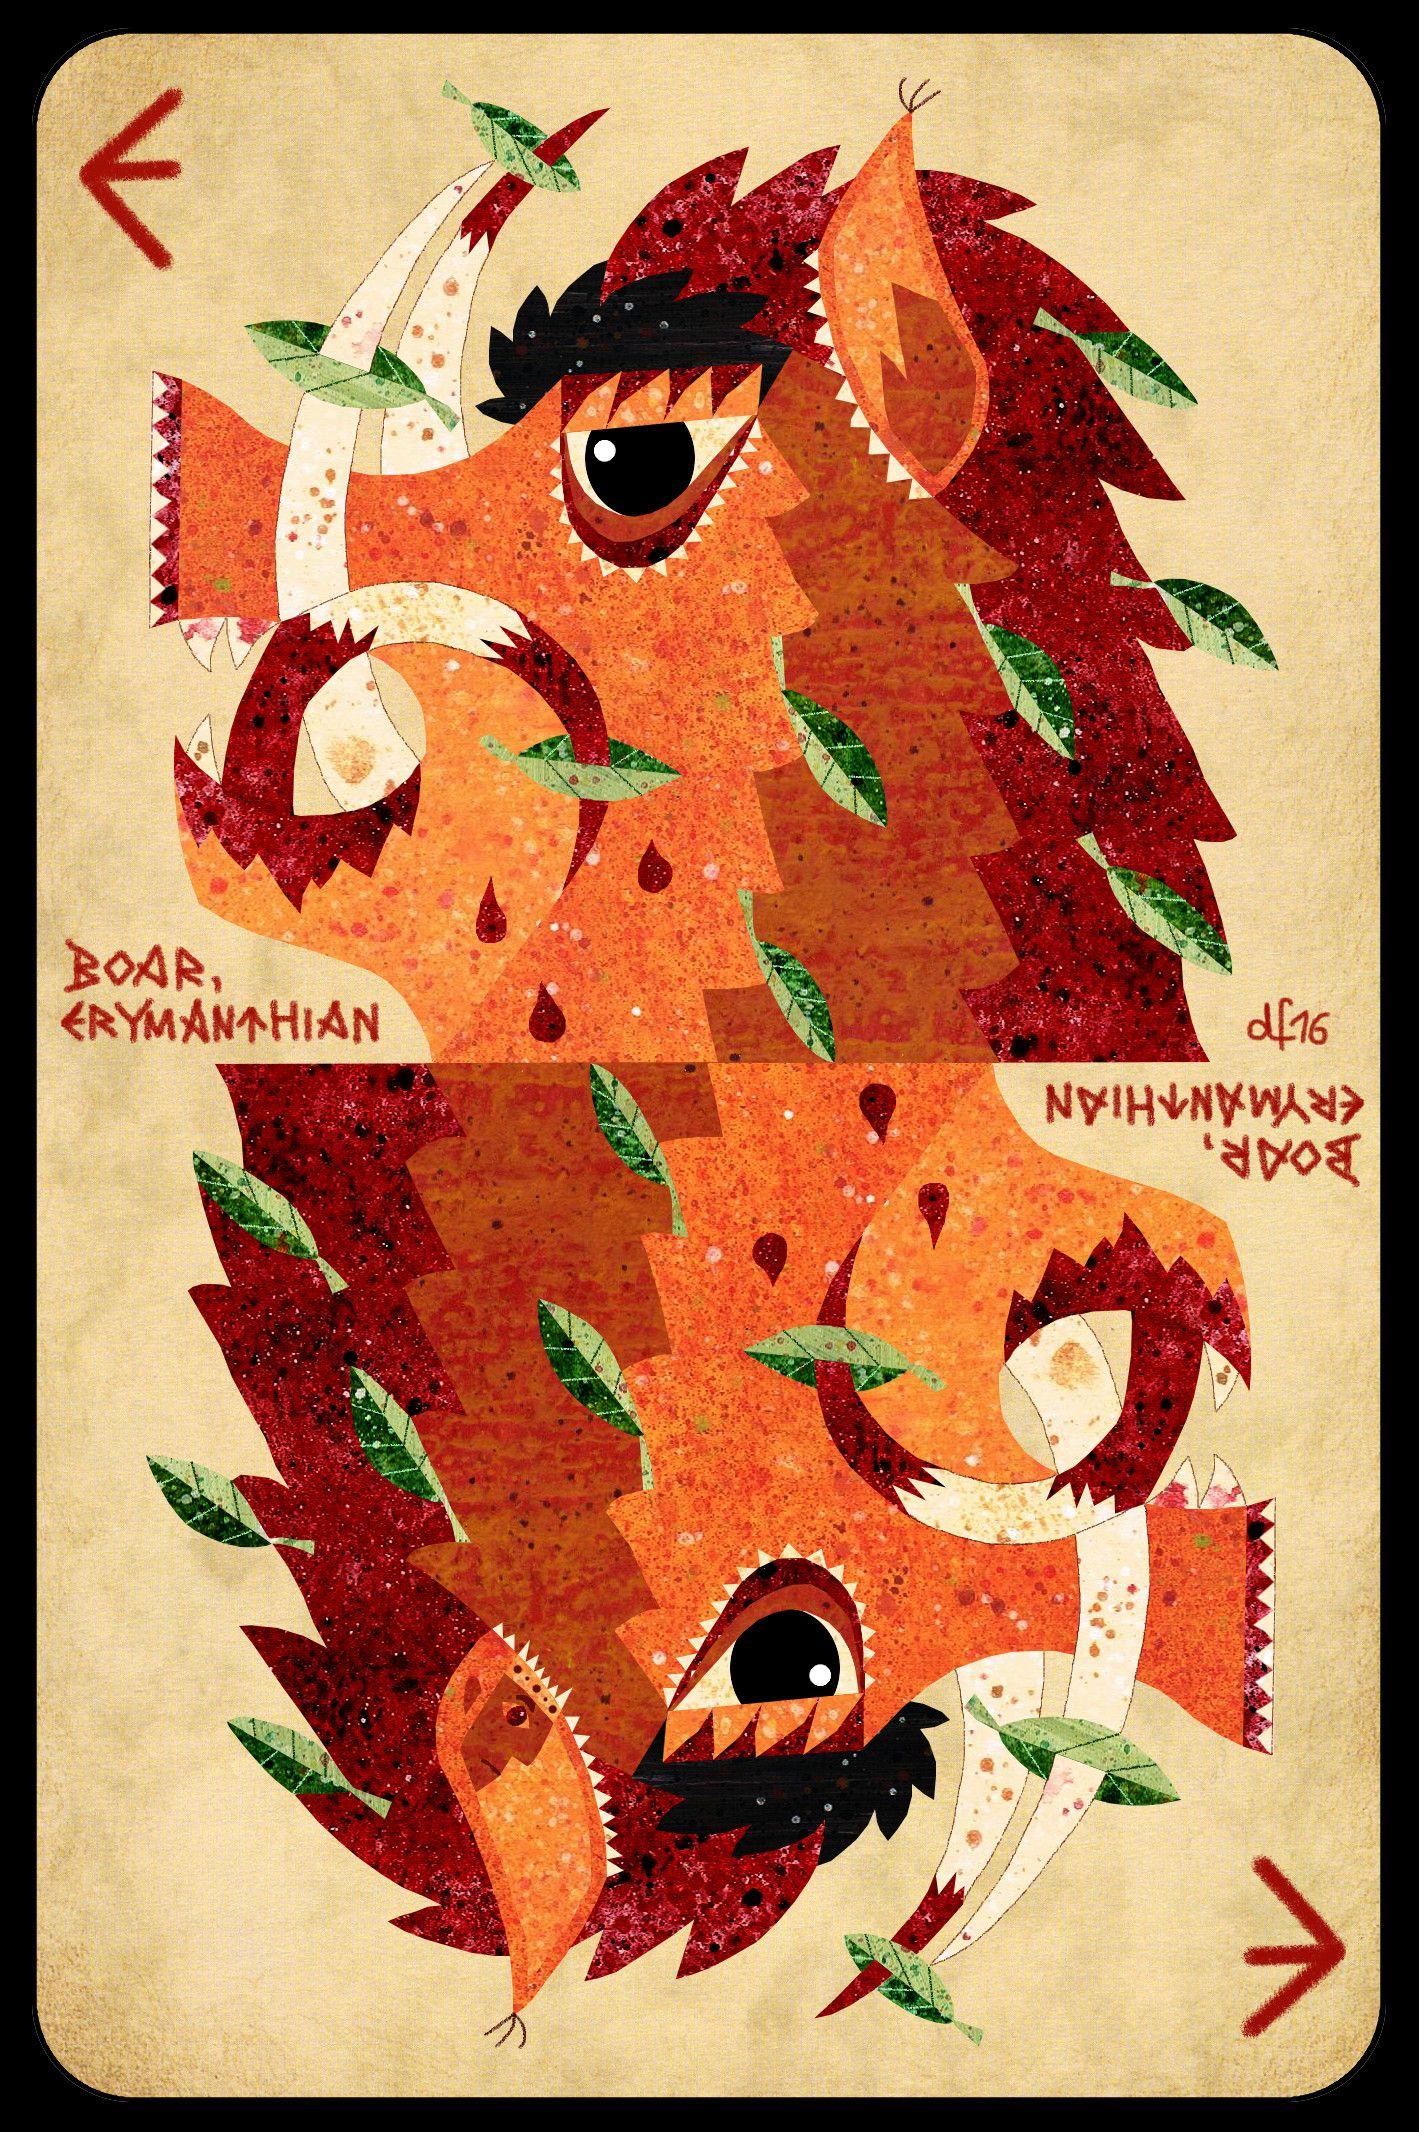 E is for Erymanthian Boar +++ Who was his last yummy victim? +++ illustration by Daniela Faber 2016 +++ quiz puzzle mythology mythical beast creature animal pig wild Hercules Herakles greek